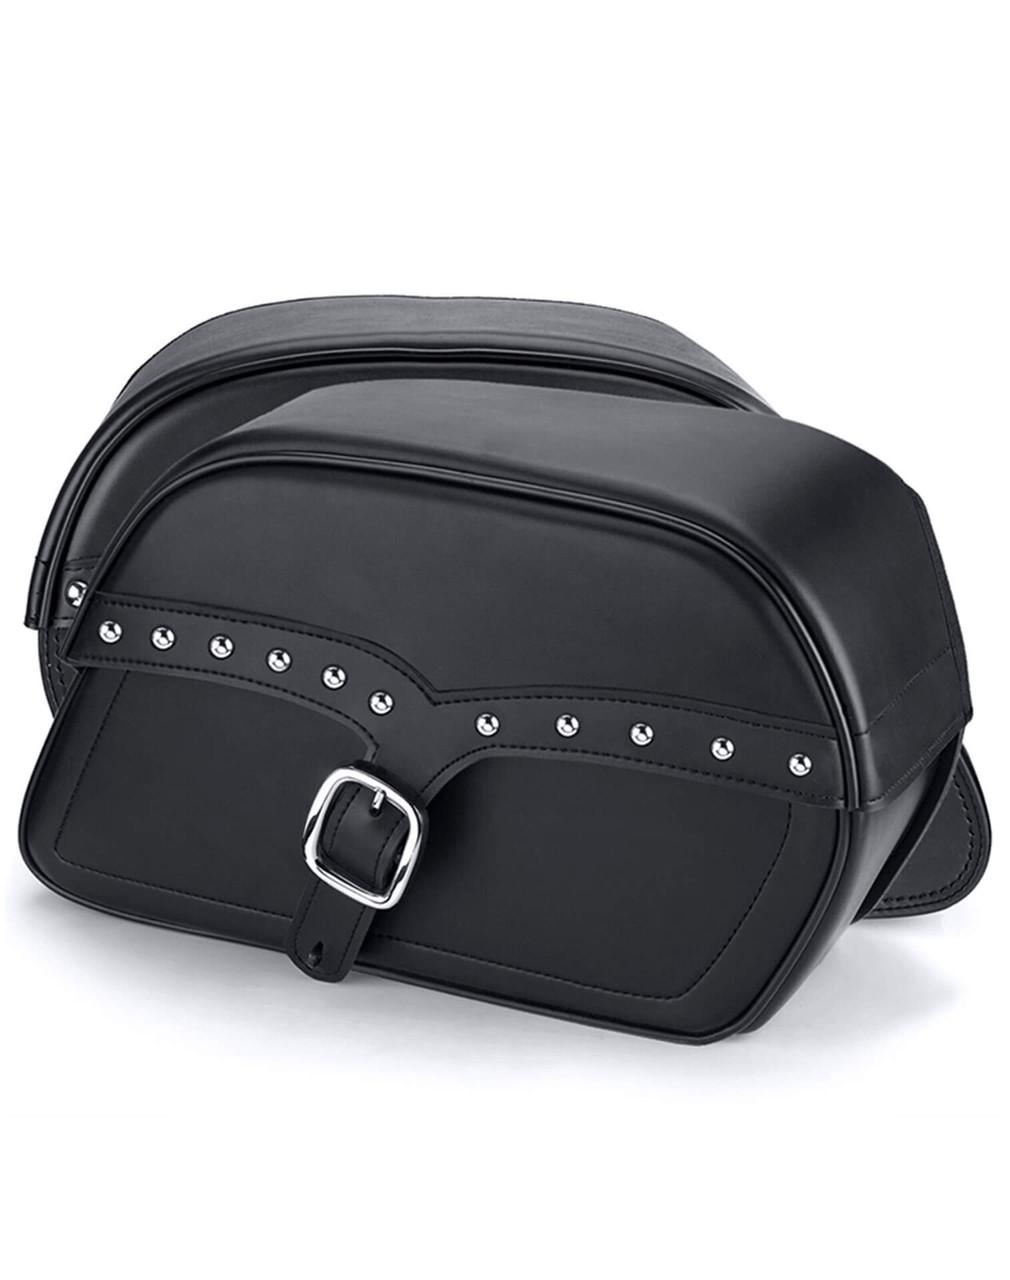 Viking Medium SS Slanted Studded Motorcycle Saddlebags For Harley Softail Custom FXSTC Both Bags View